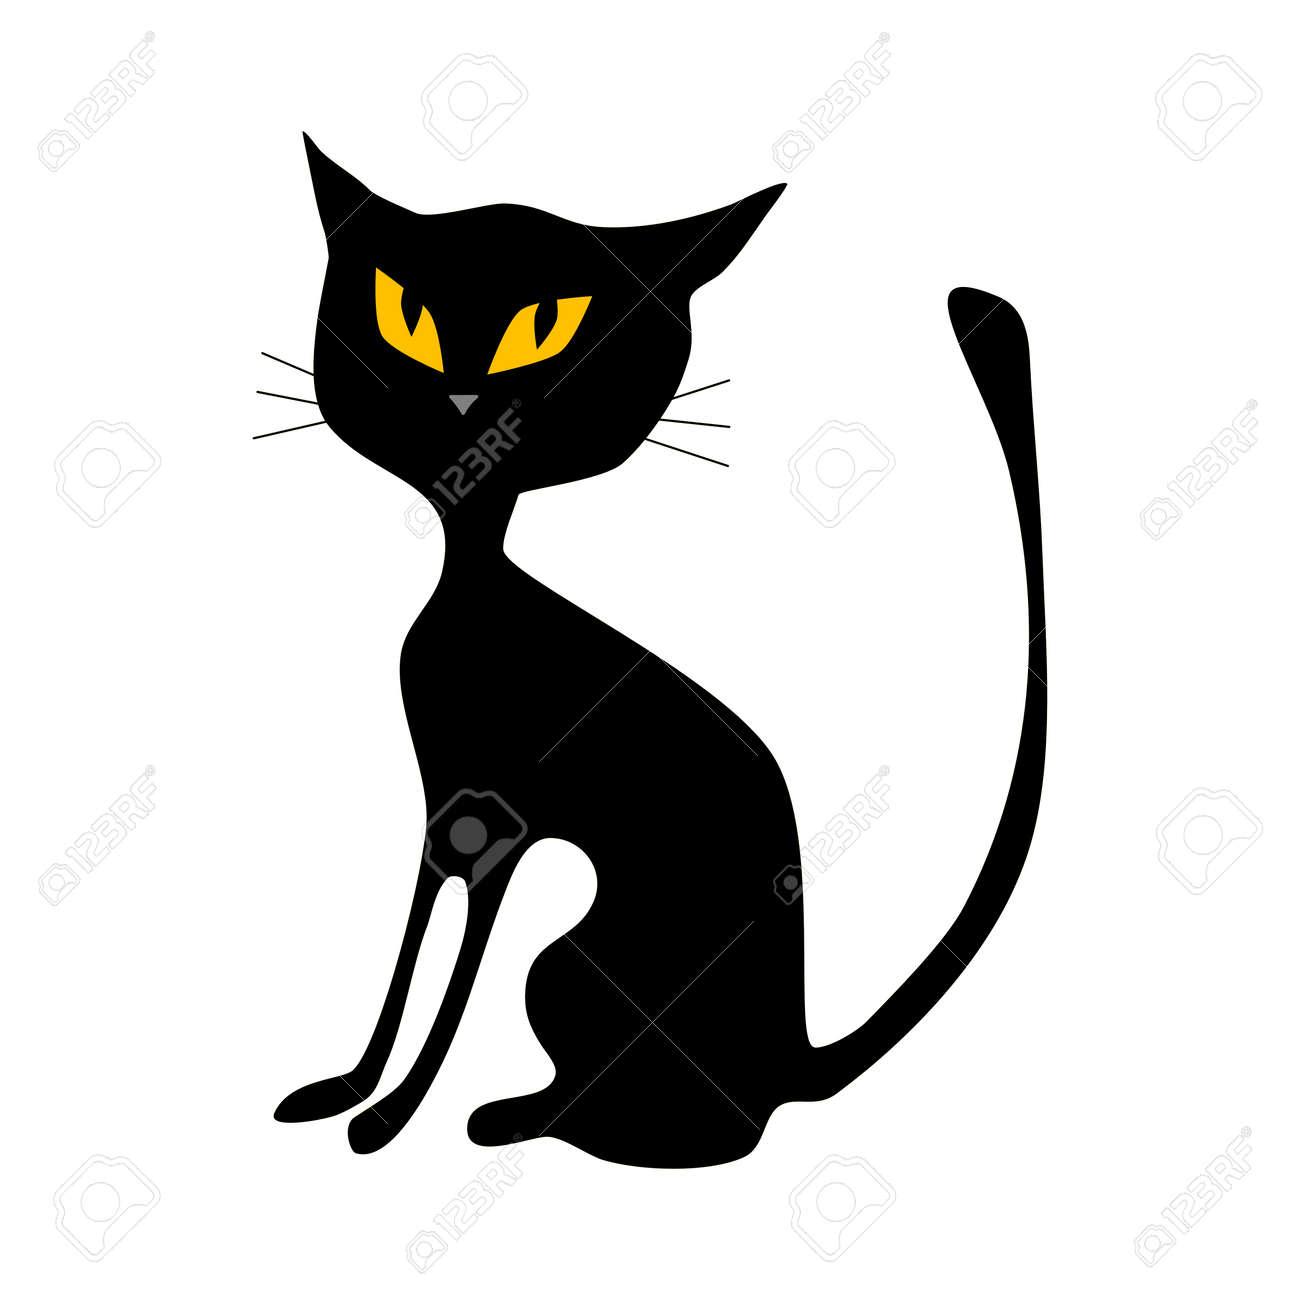 Black cat. halloween cat isolated on white background. vector illustration - 155462561